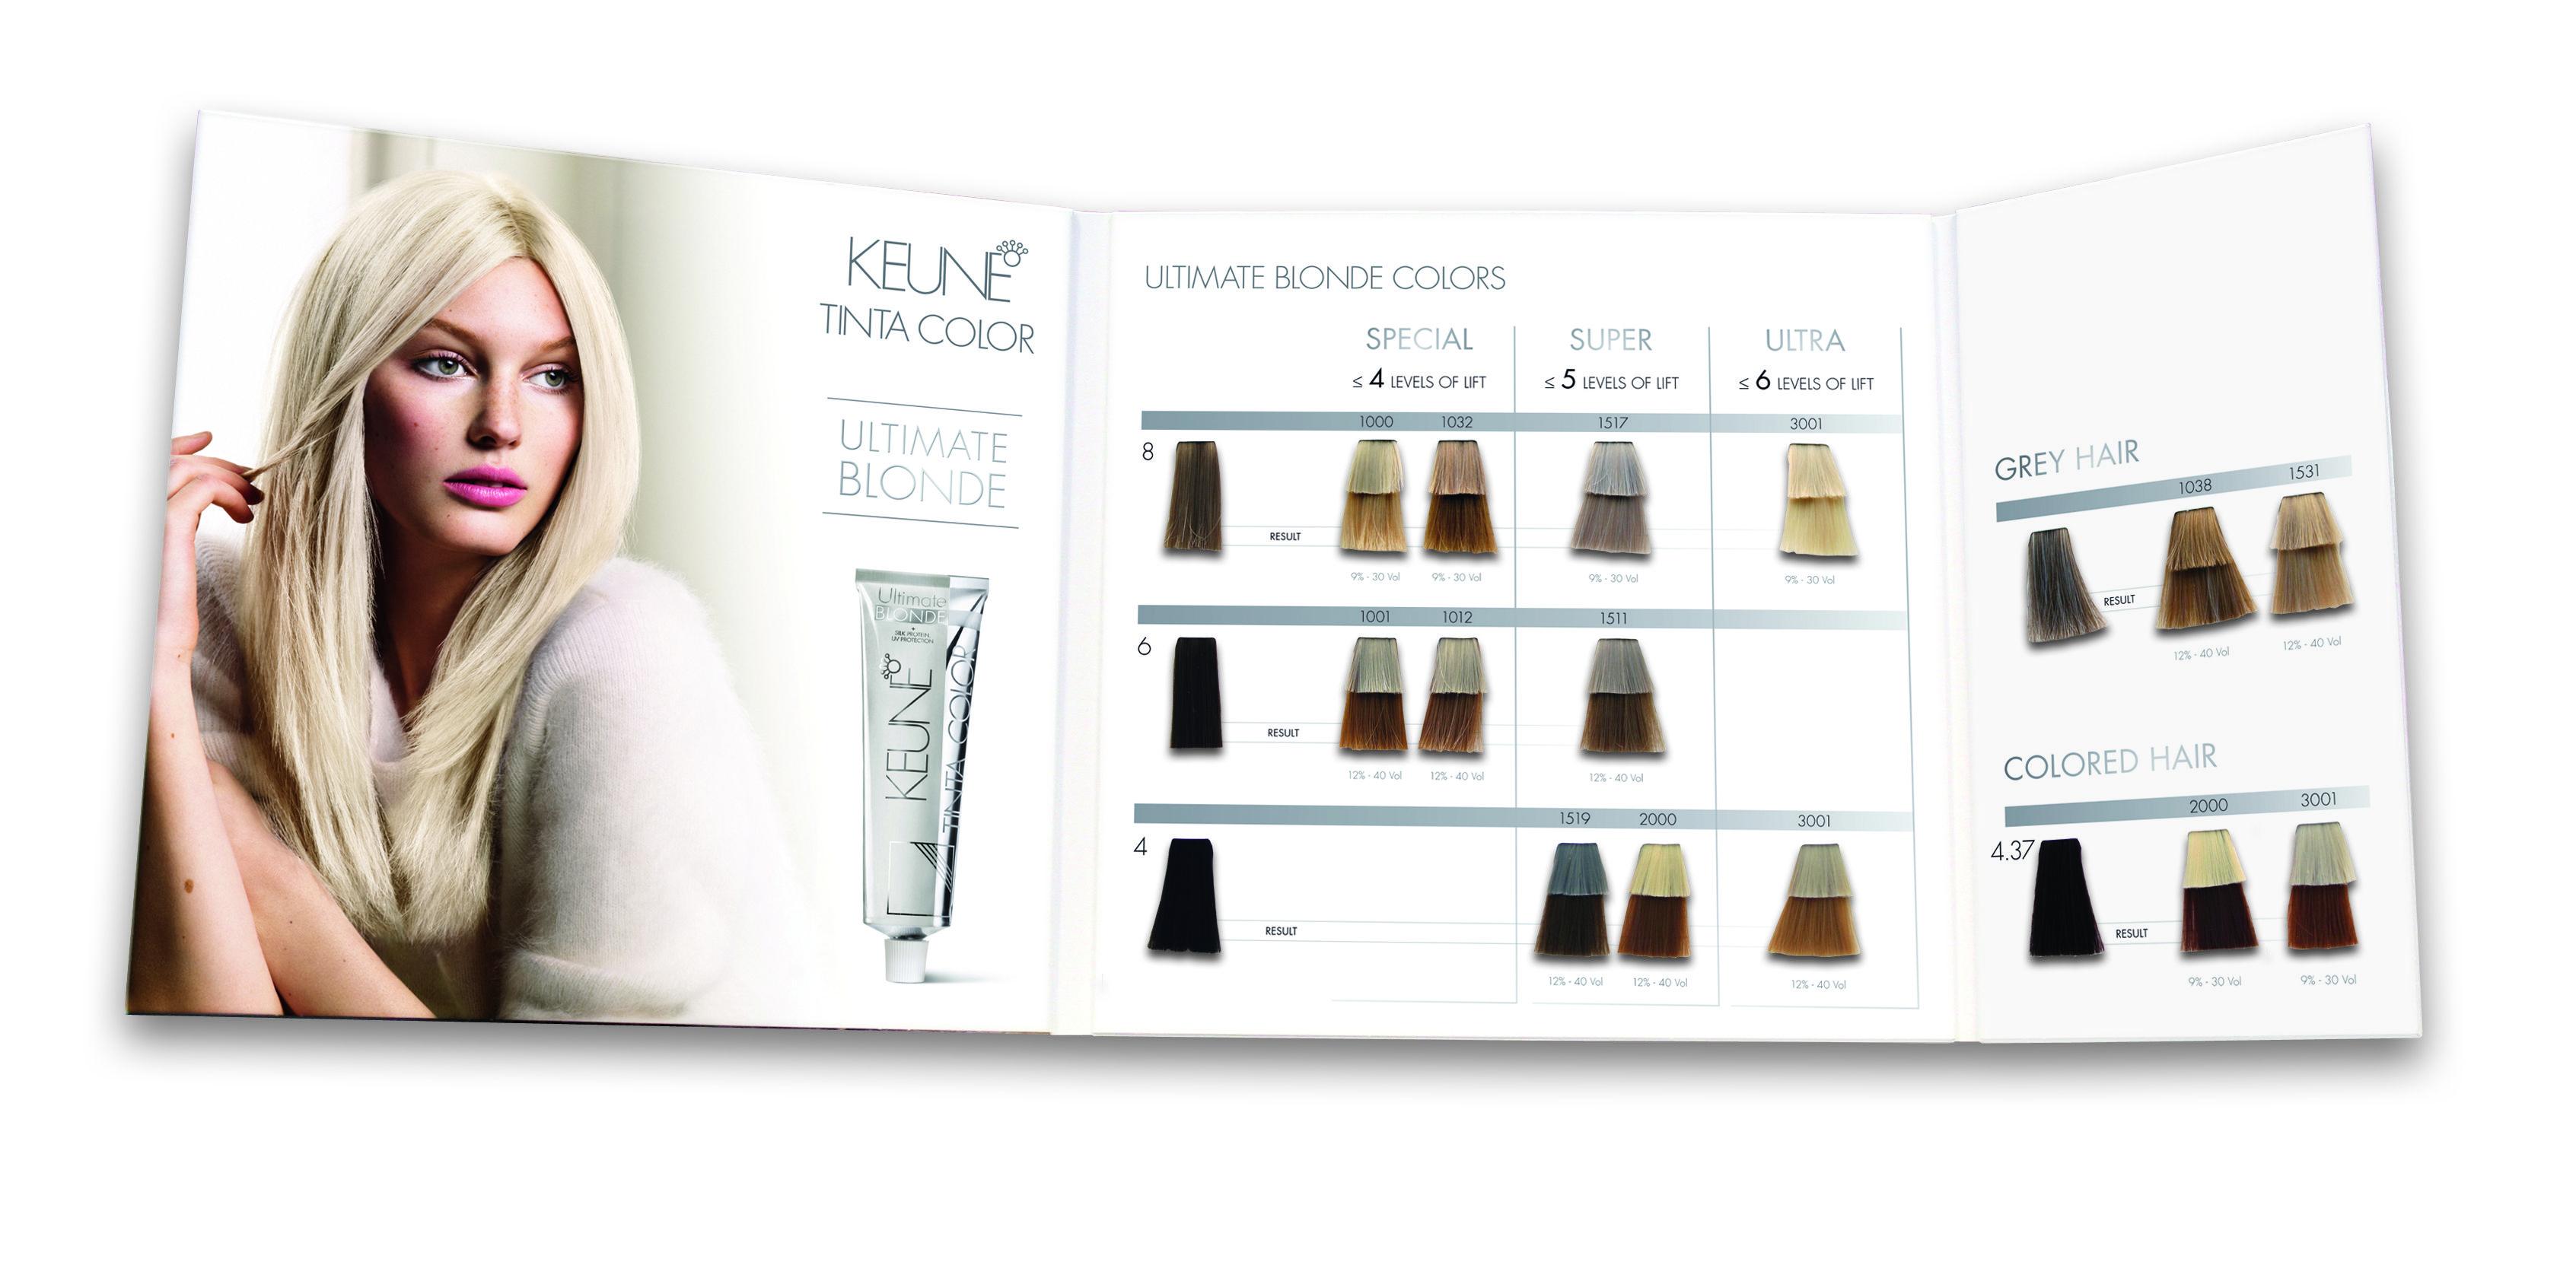 Keune Tinta Color Ultimate Blonde Swatch Book